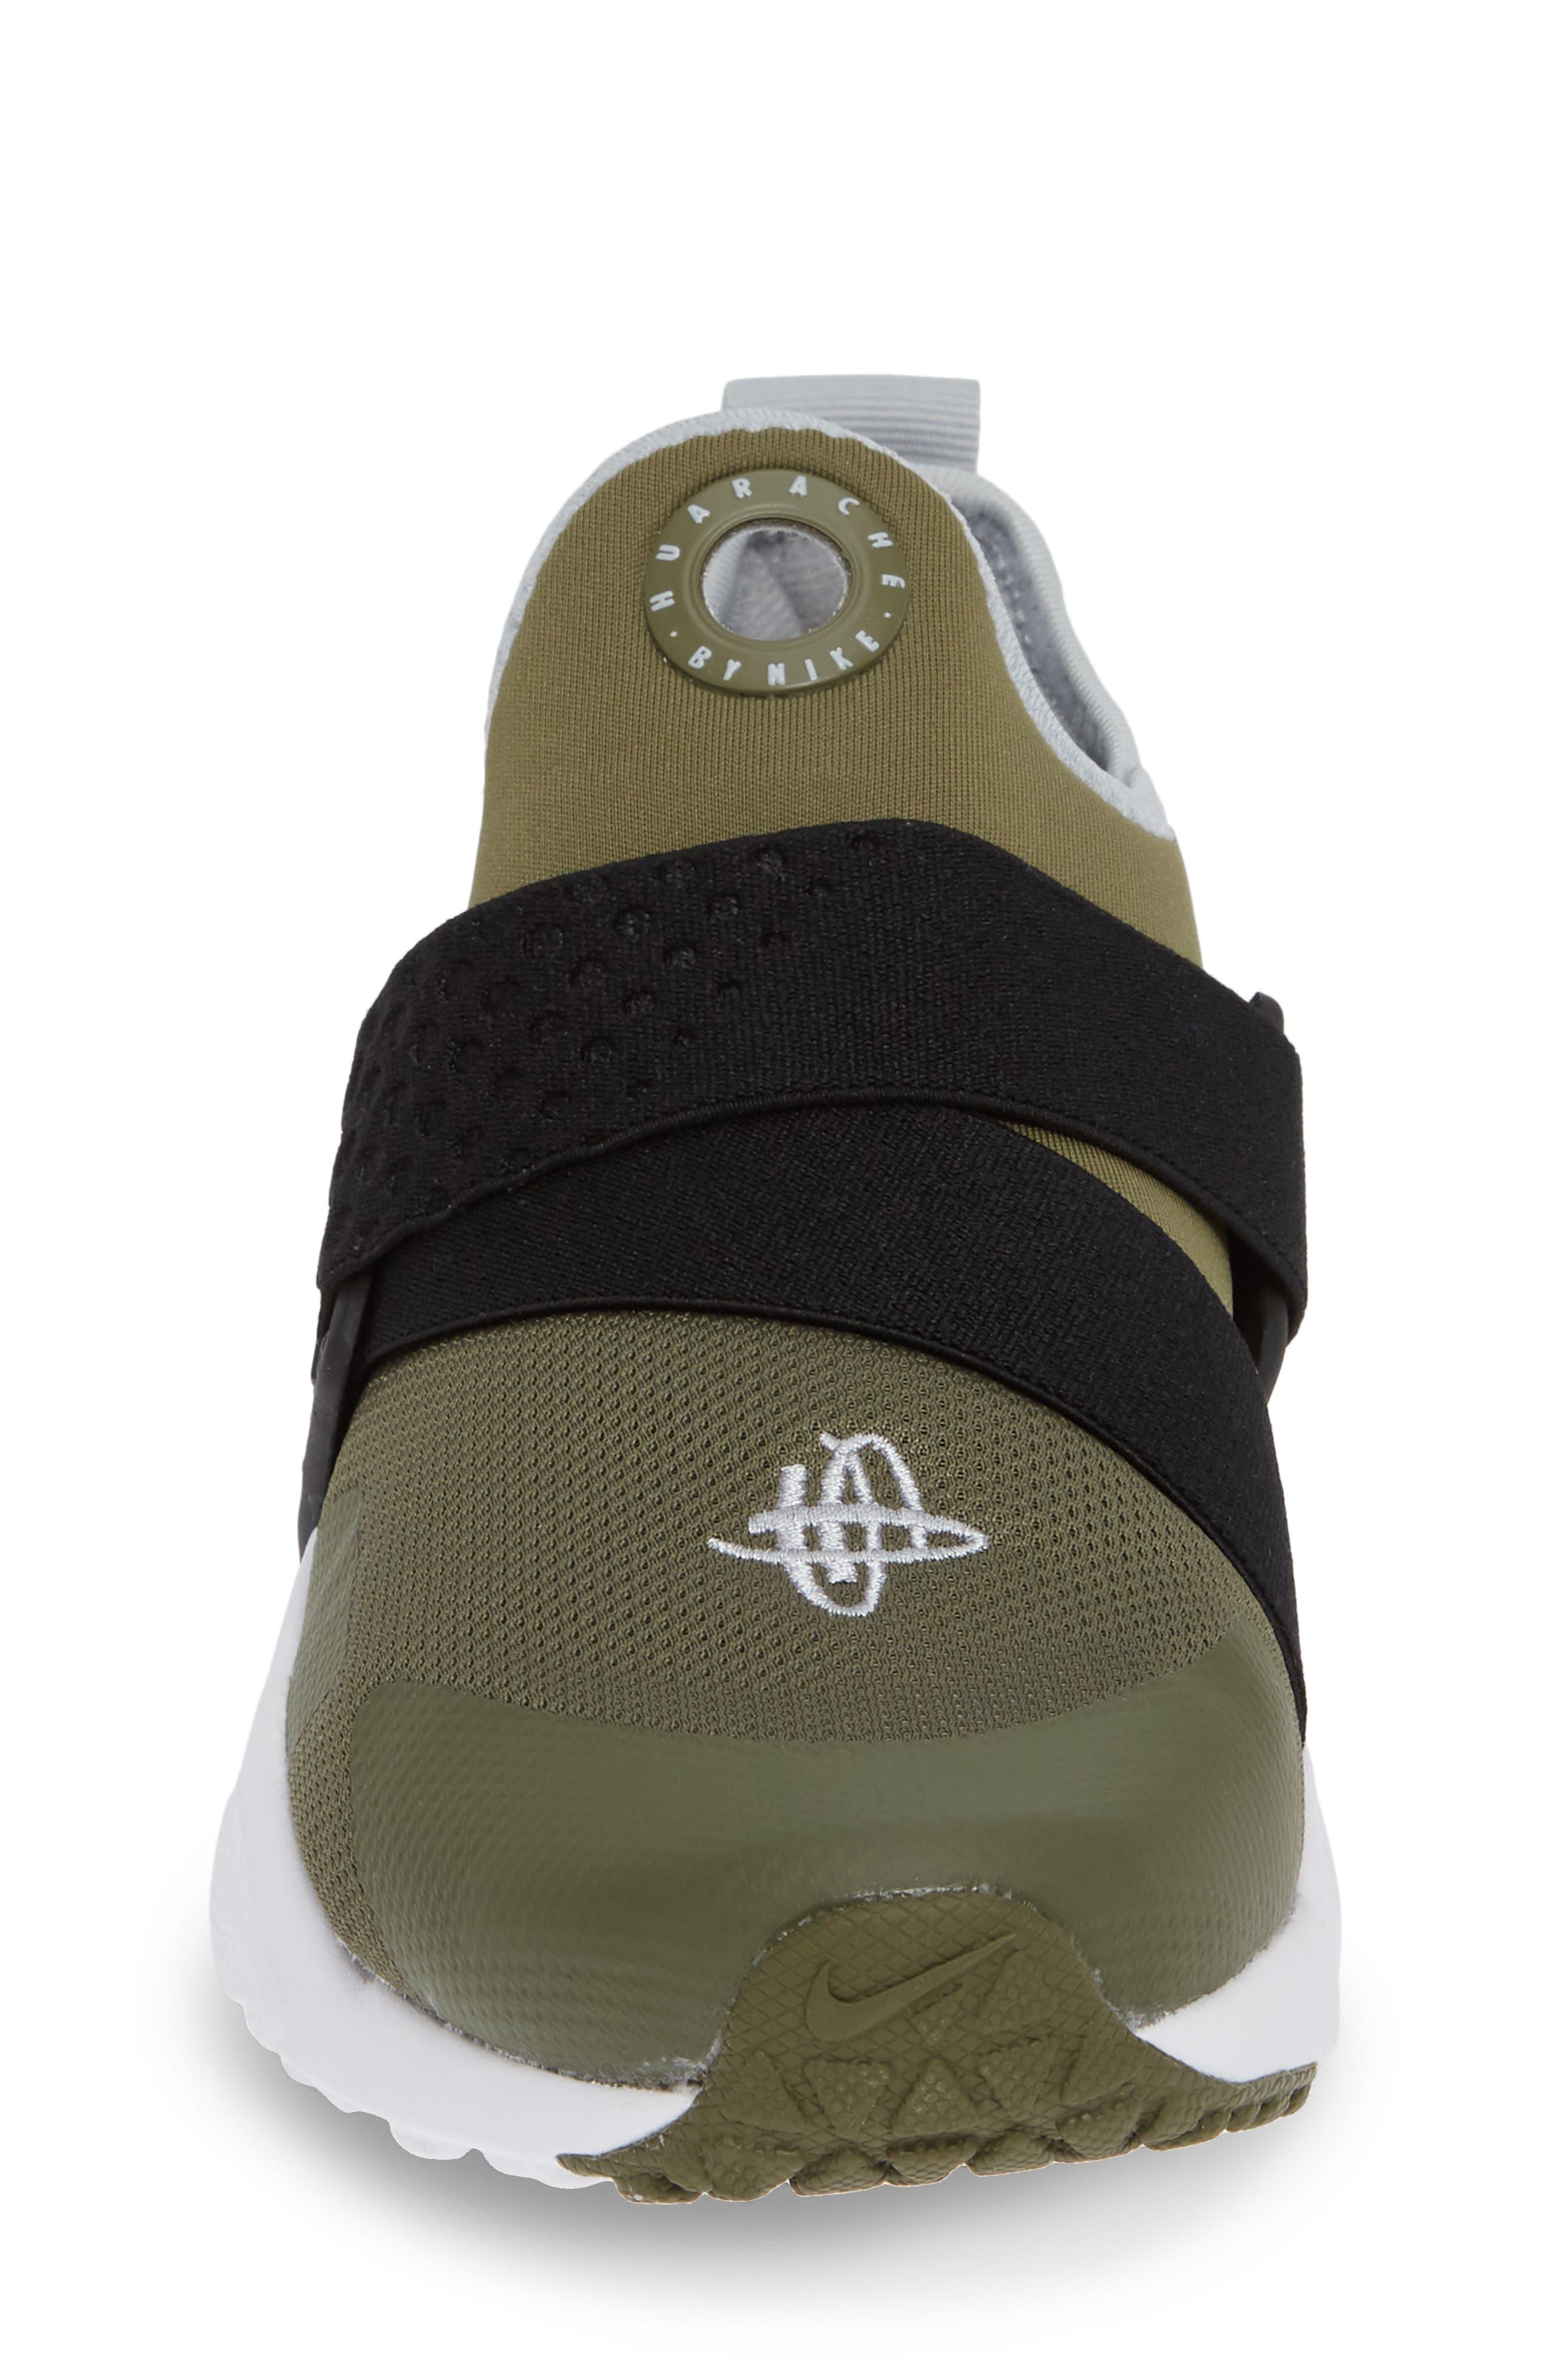 Huarache Extreme Sneaker,                             Alternate thumbnail 5, color,                             Olive/ Wolf Grey/ Black/ White